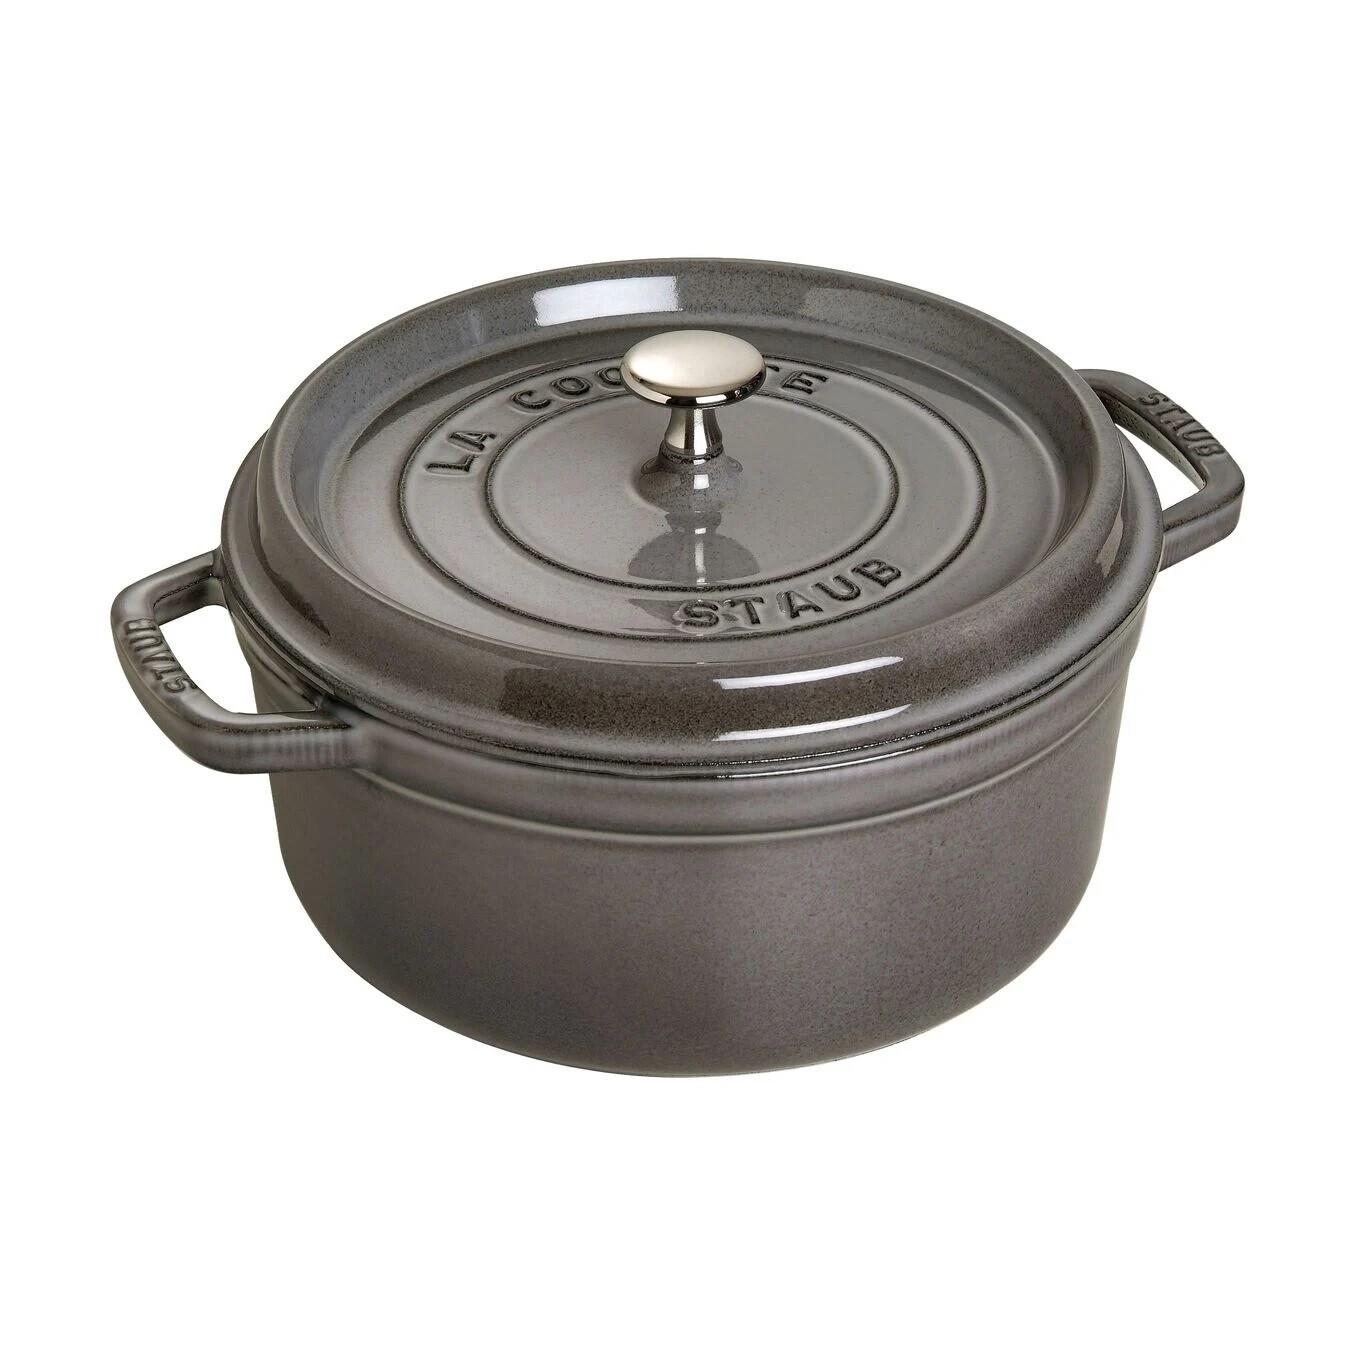 STAUB 'la cocotte' ronde stoofpot 26cm / 5,25L grafietgrijs  PROMO 269,00 -20%